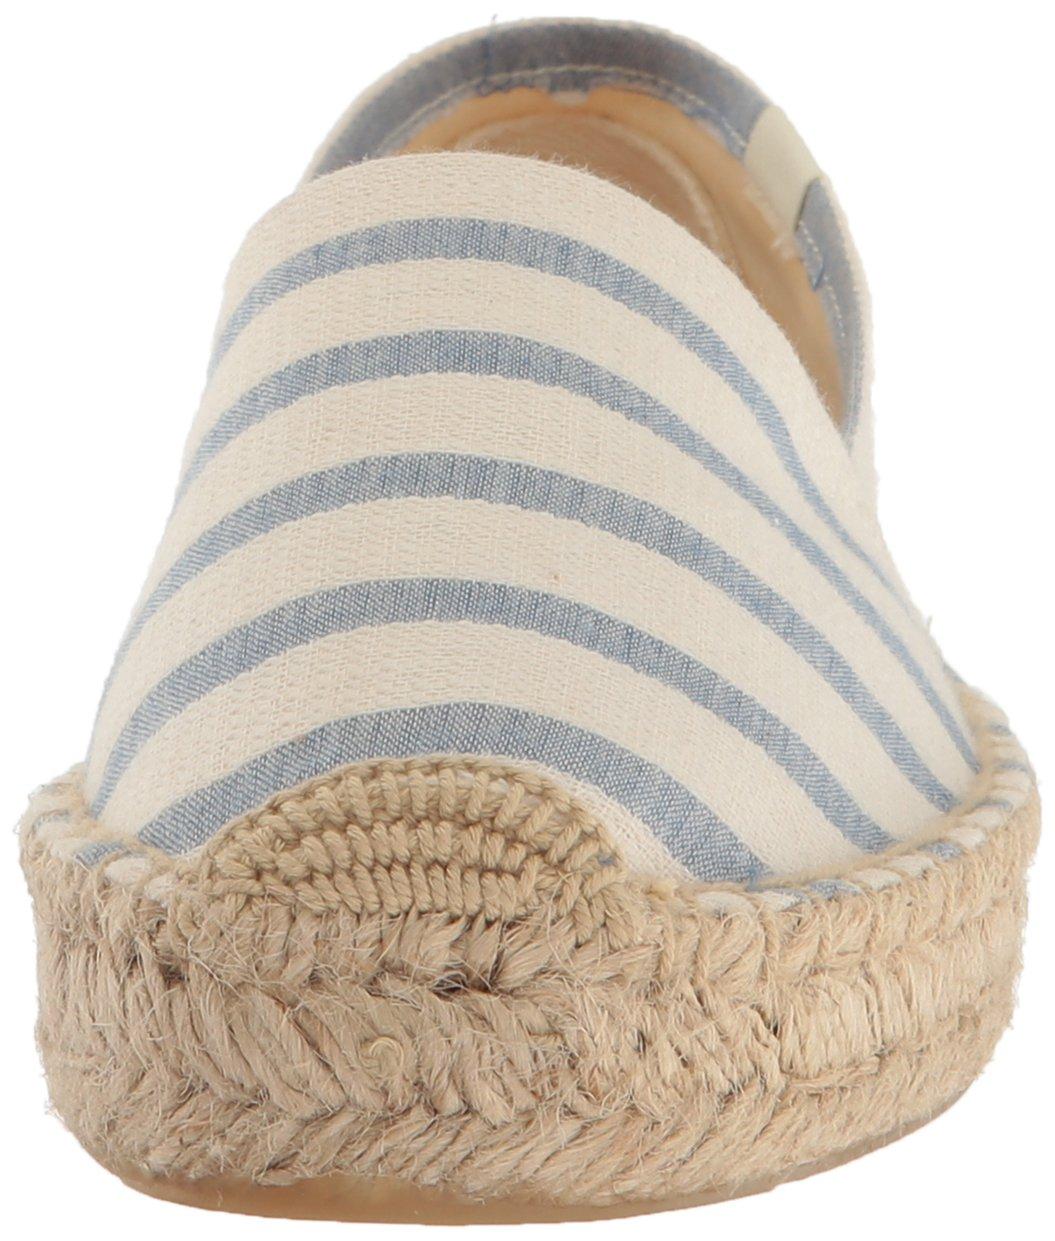 Soludos Women's Striped Original Platform Slipper B06X6CZ2JK 5.5 B(M) US|Natural/Blue